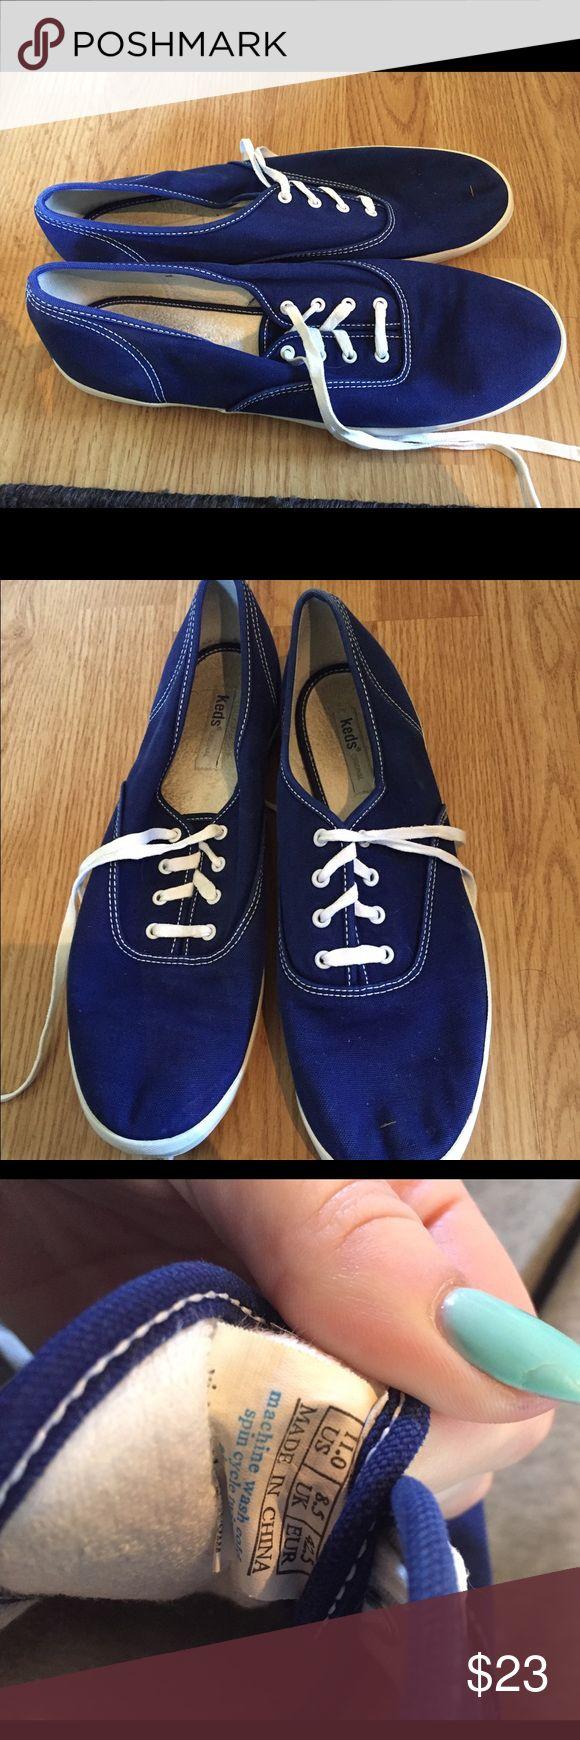 KEDS Champion (dark royal blue) - Size 11 Good condition dark royal blue Keds! Keds Shoes Sneakers